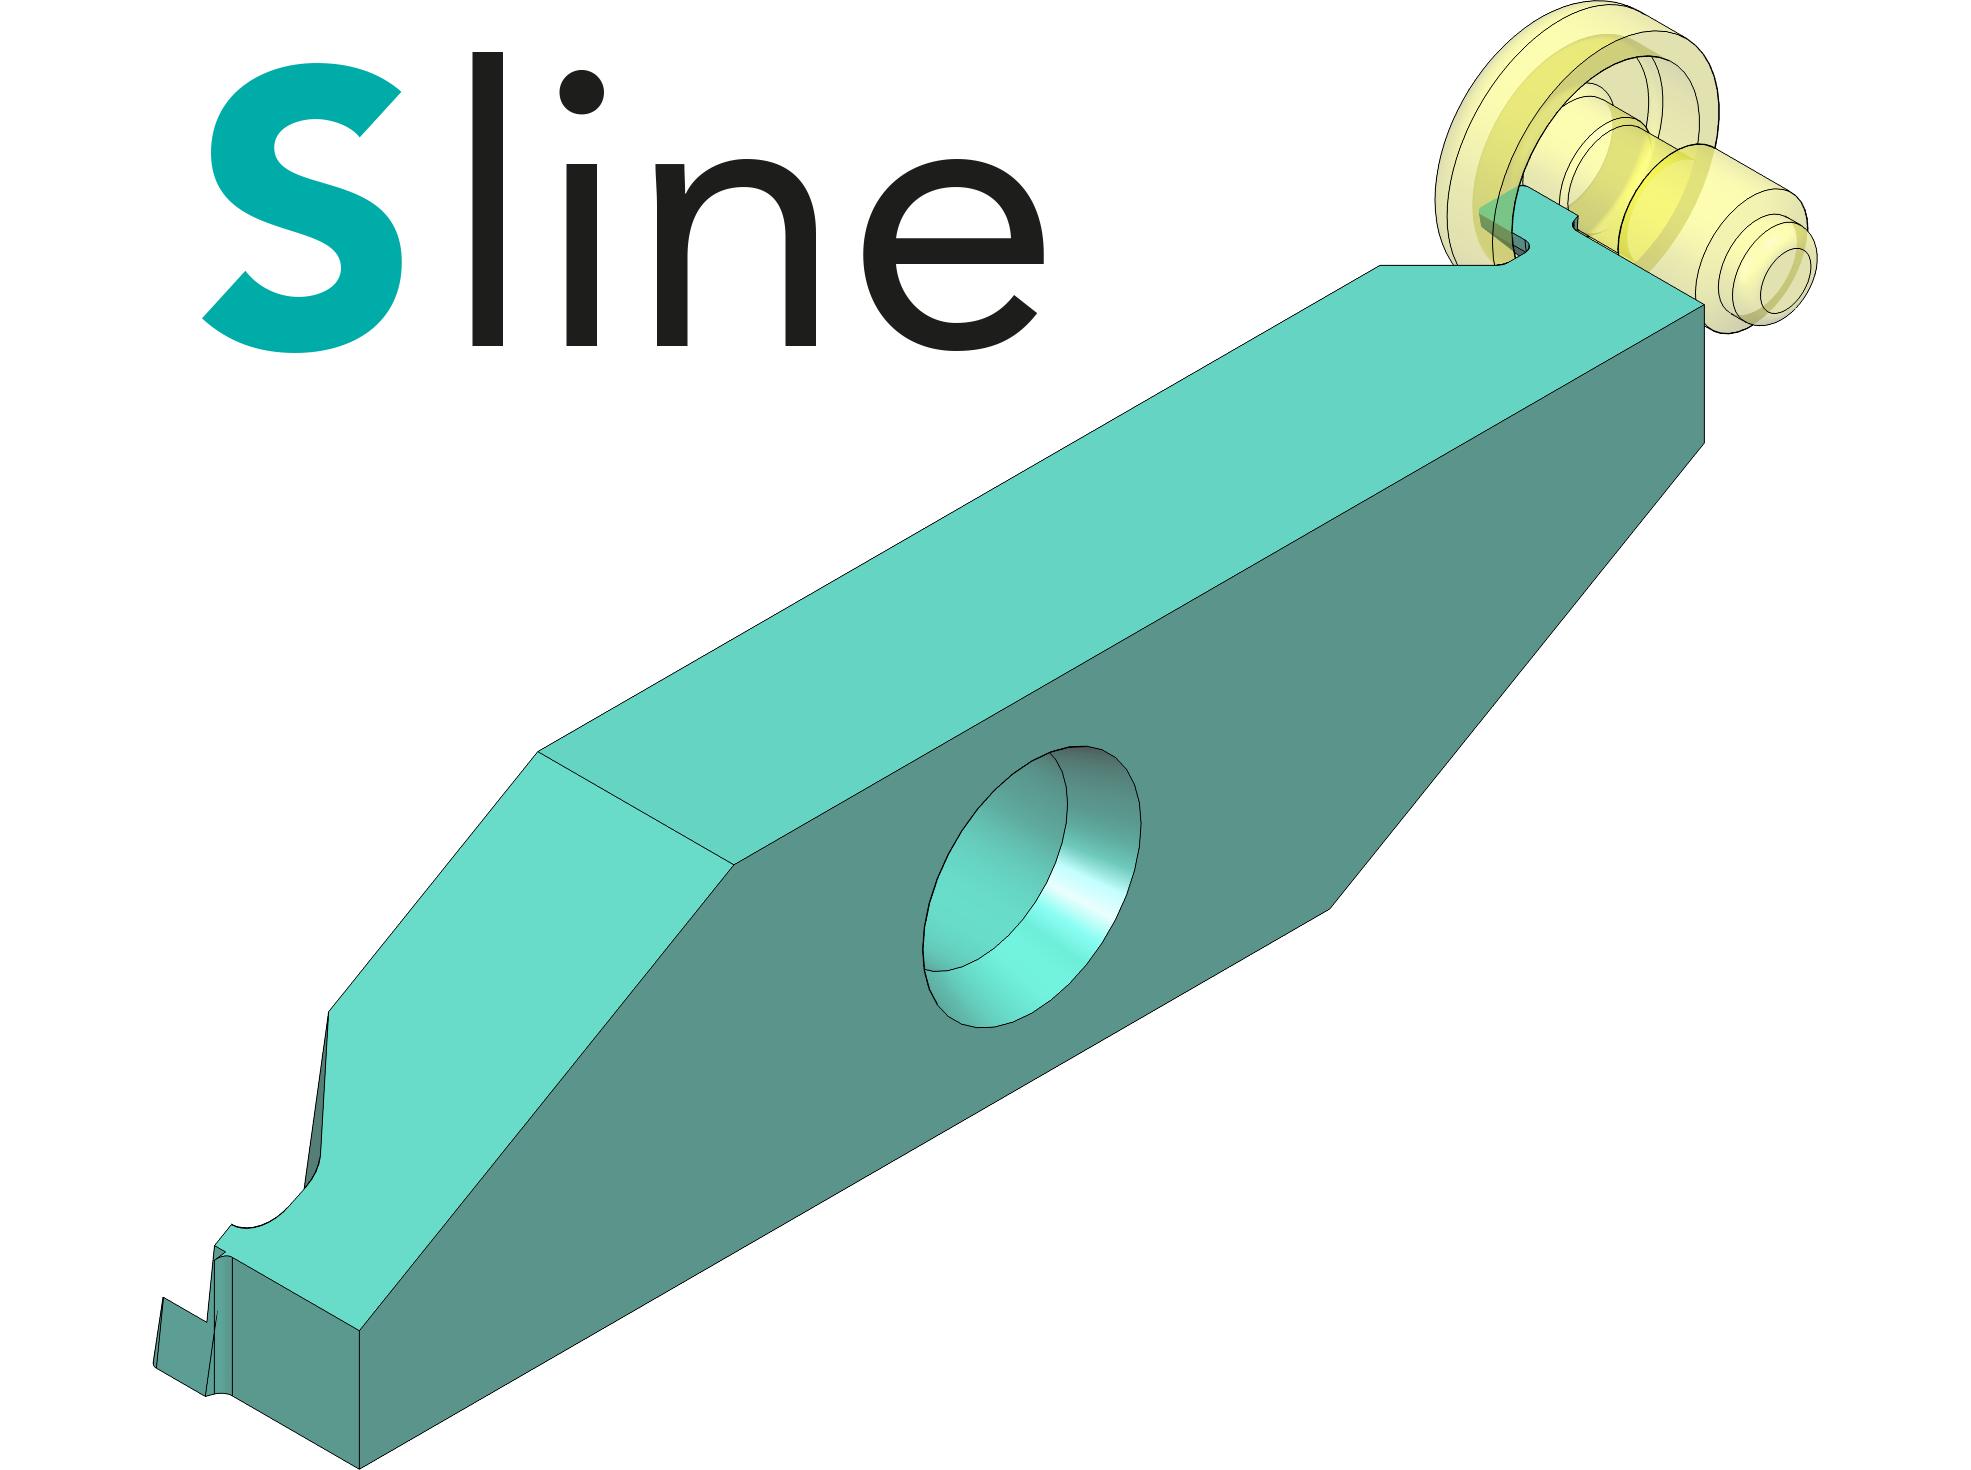 Sline_1